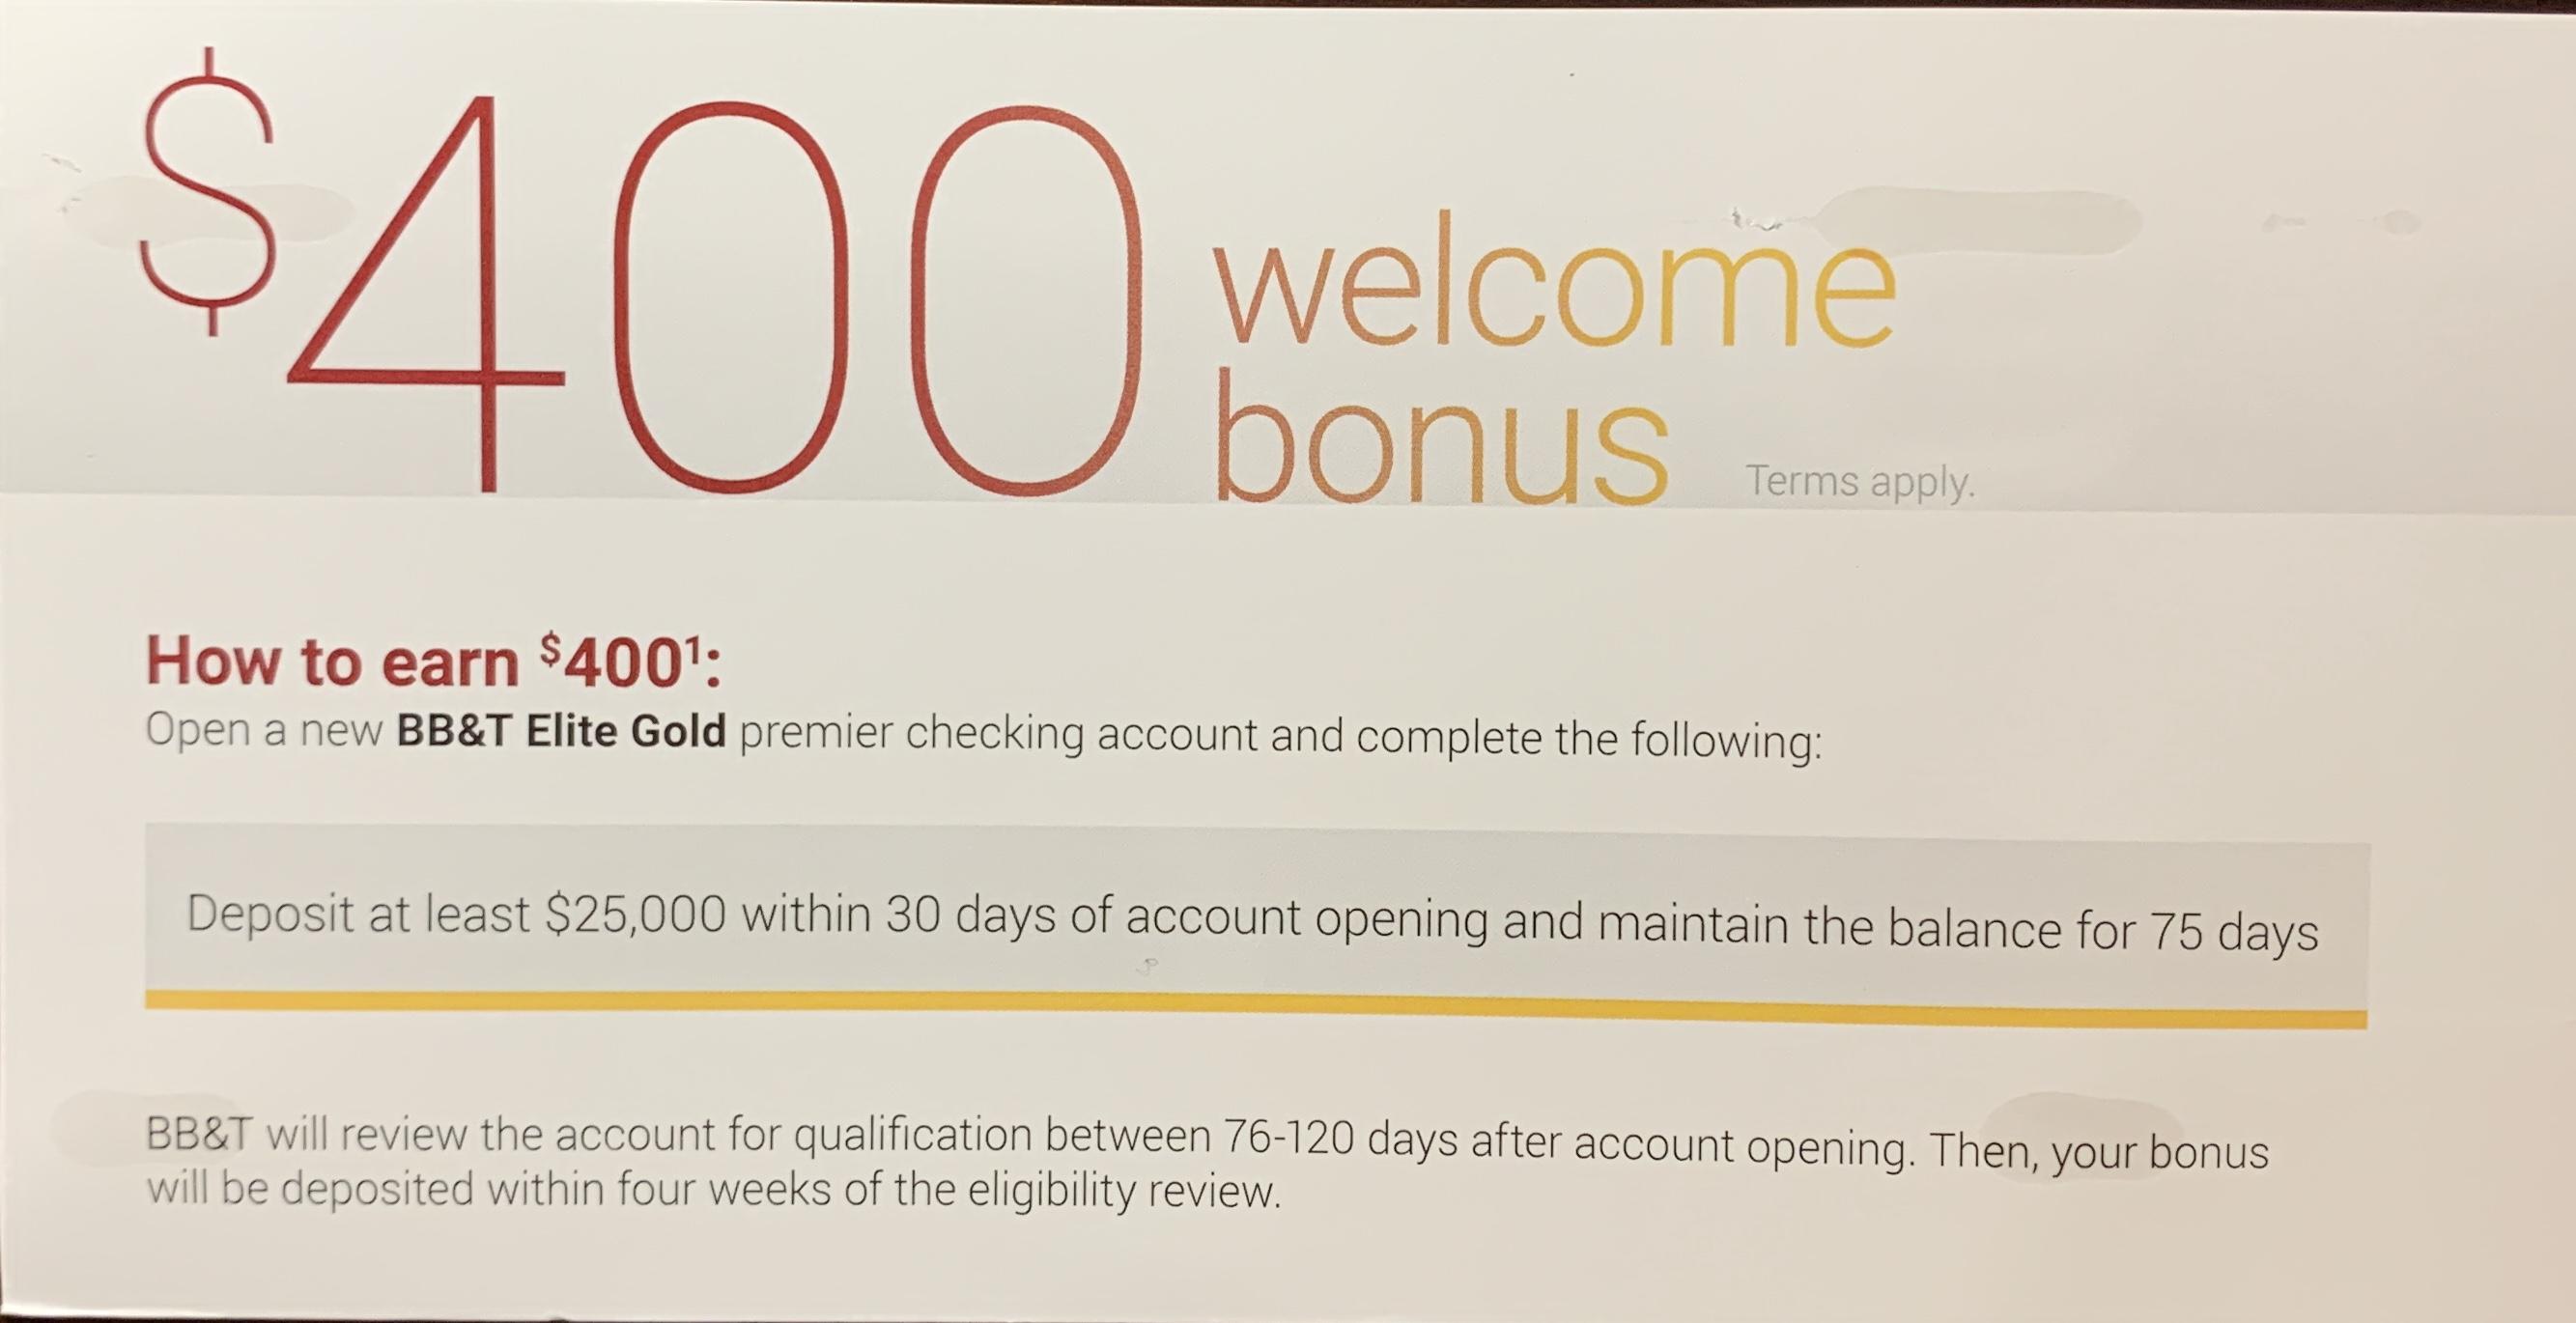 BB&T Bank $400 Bonus for Opening an Elite Gold Premier checking Acct w/ $25,000